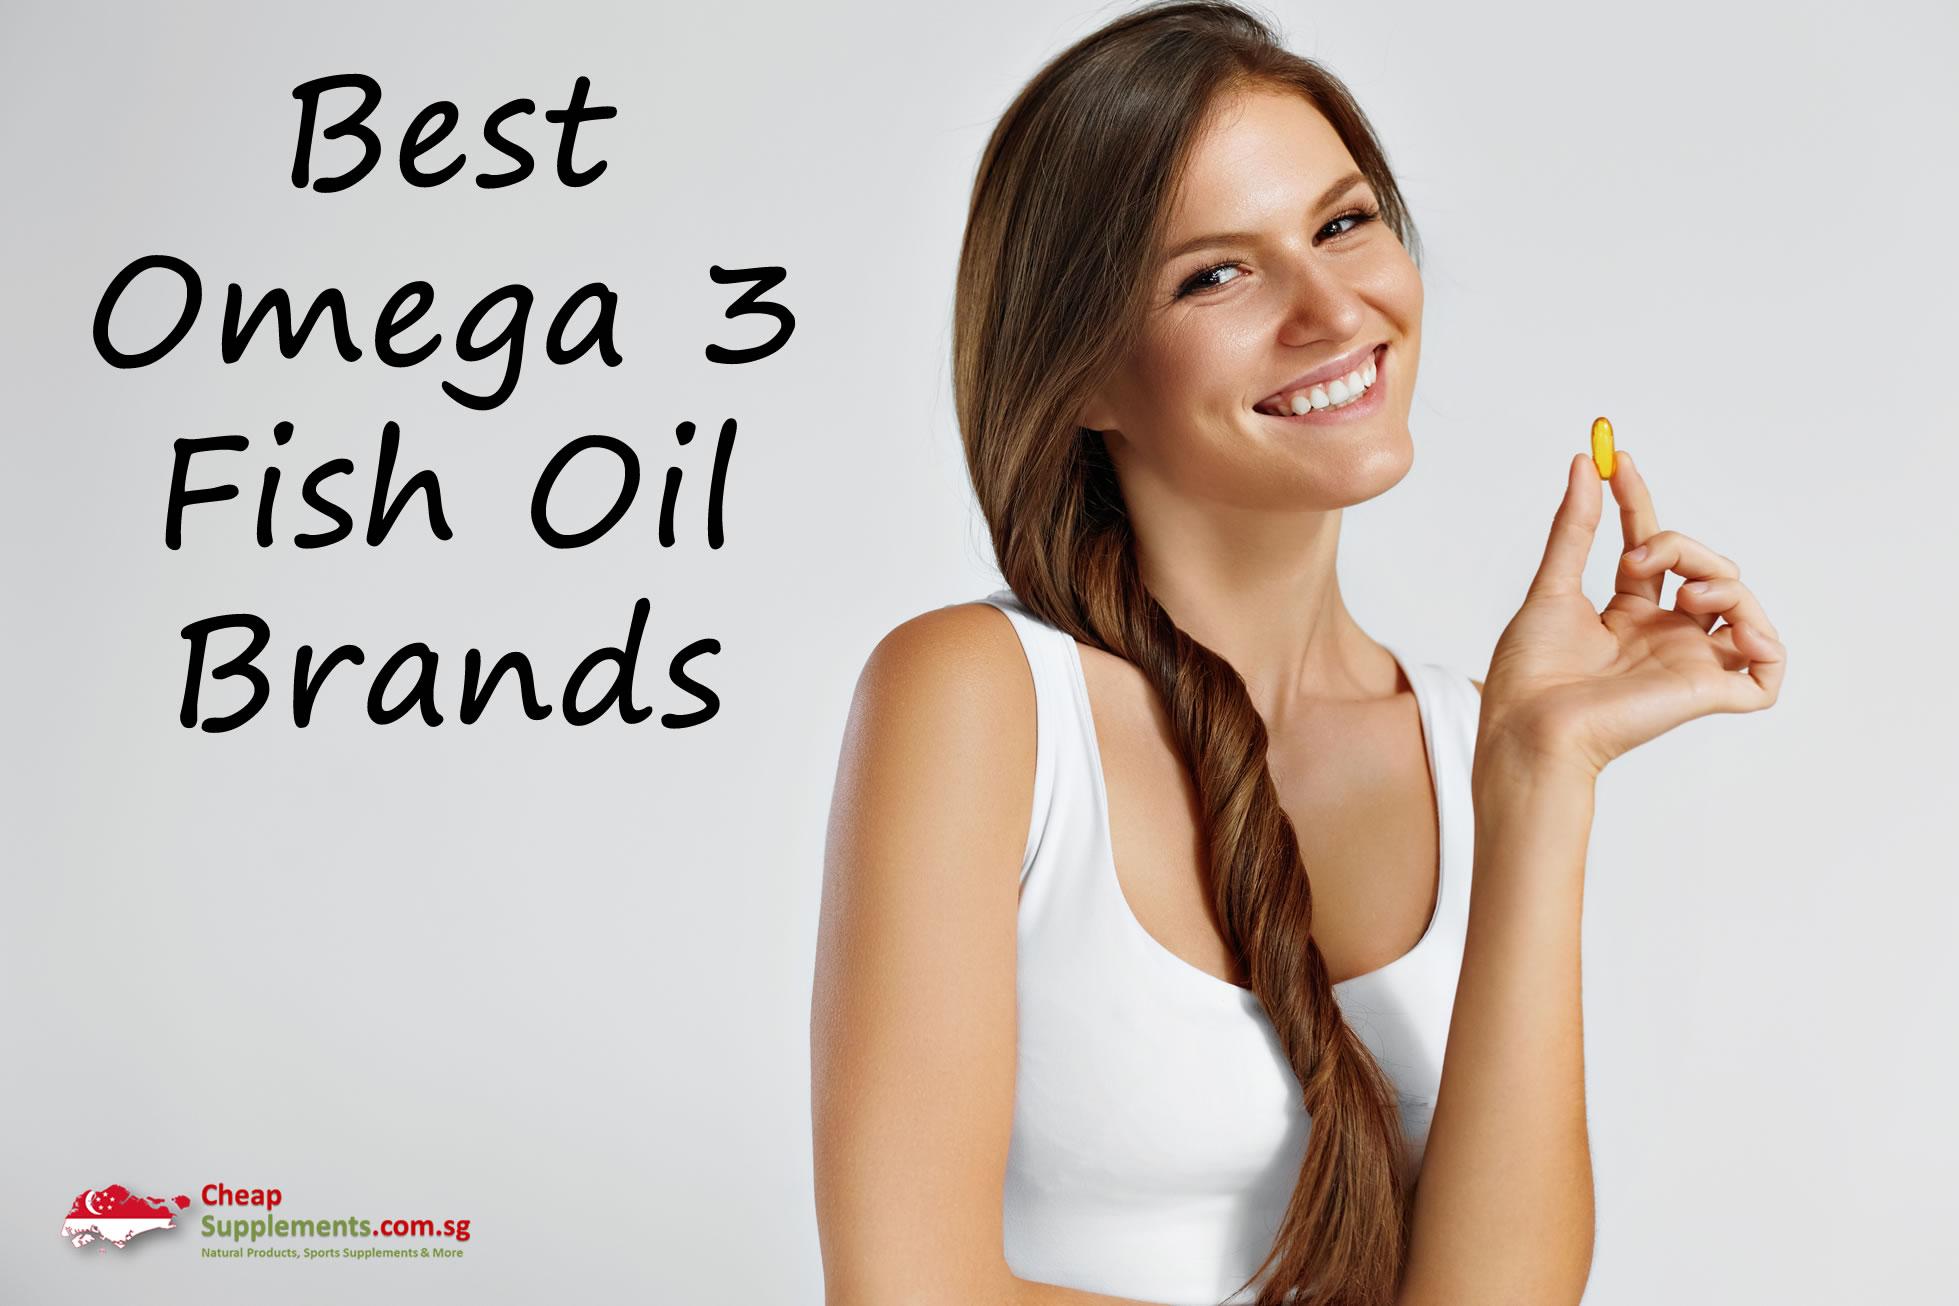 Best omega 3 fish oil brands for Best omega 3 fish